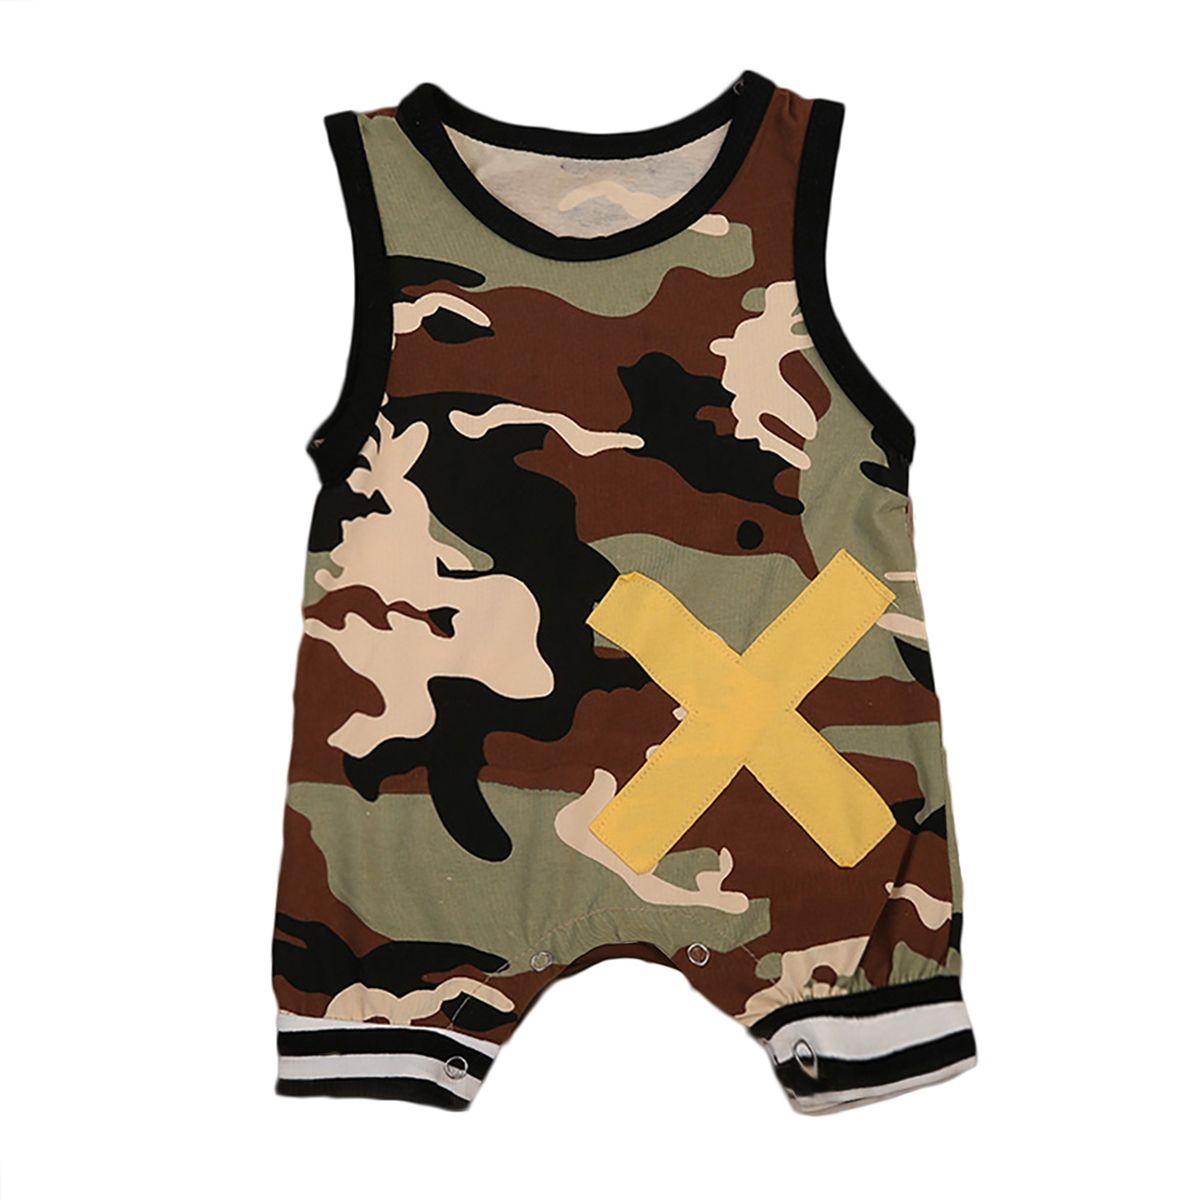 dd1a0db8a1f Newborn Infant Kids Baby Boys Clothes Jumpsuit Romper Sunsuit Playsuit  Outfits Sleeveless Cotton Clothes  Affiliate